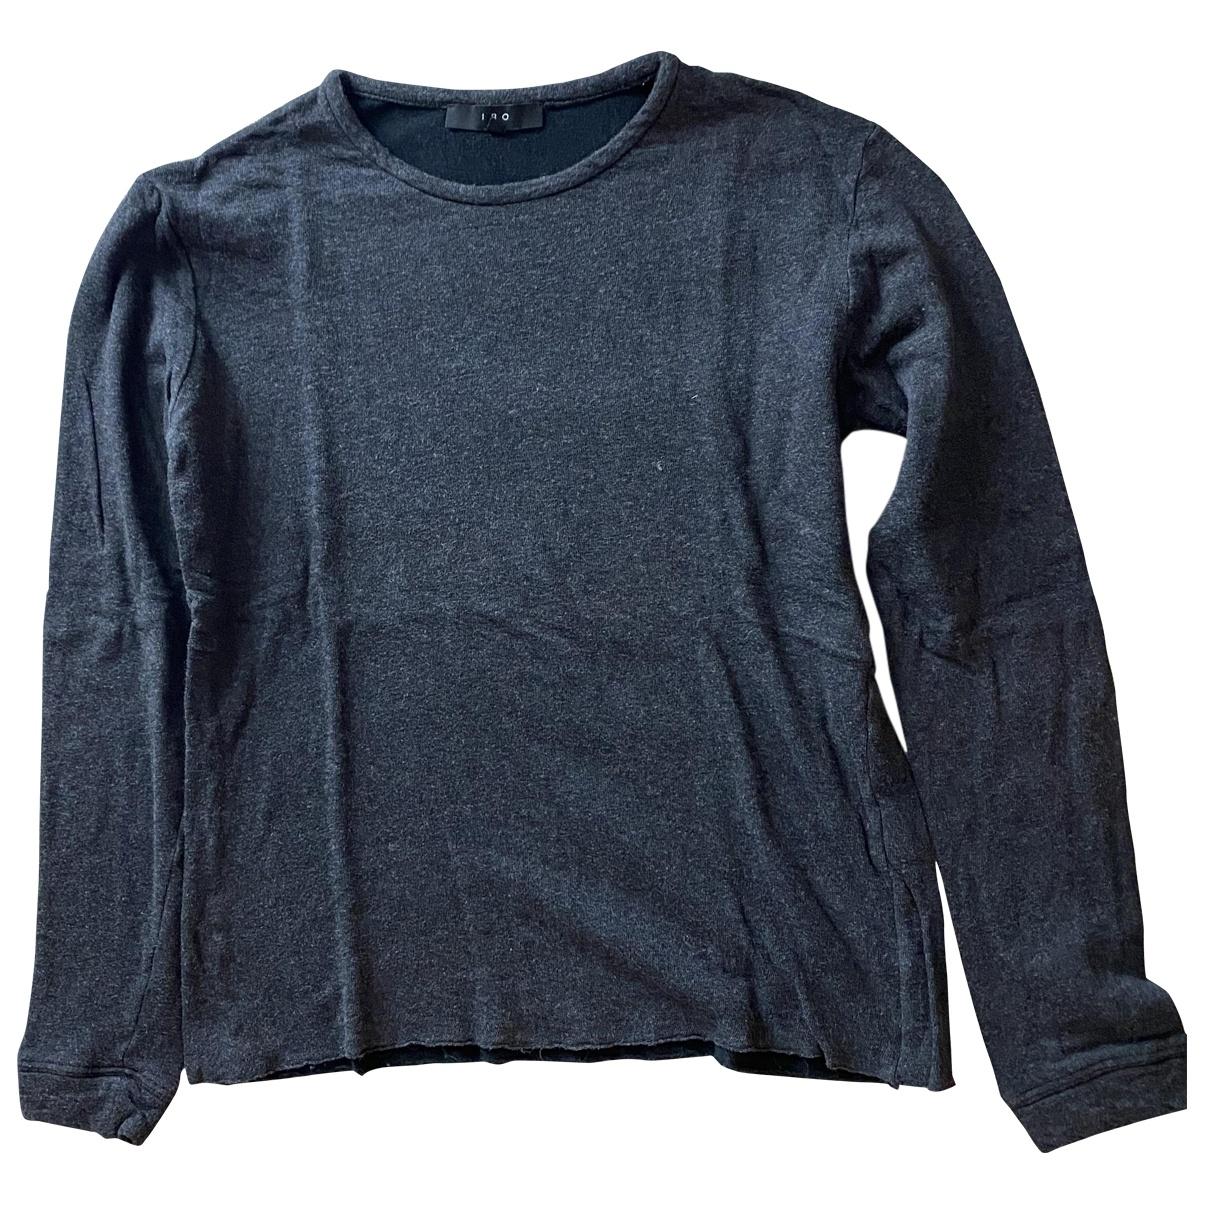 Iro \N T-Shirts in  Anthrazit Baumwolle